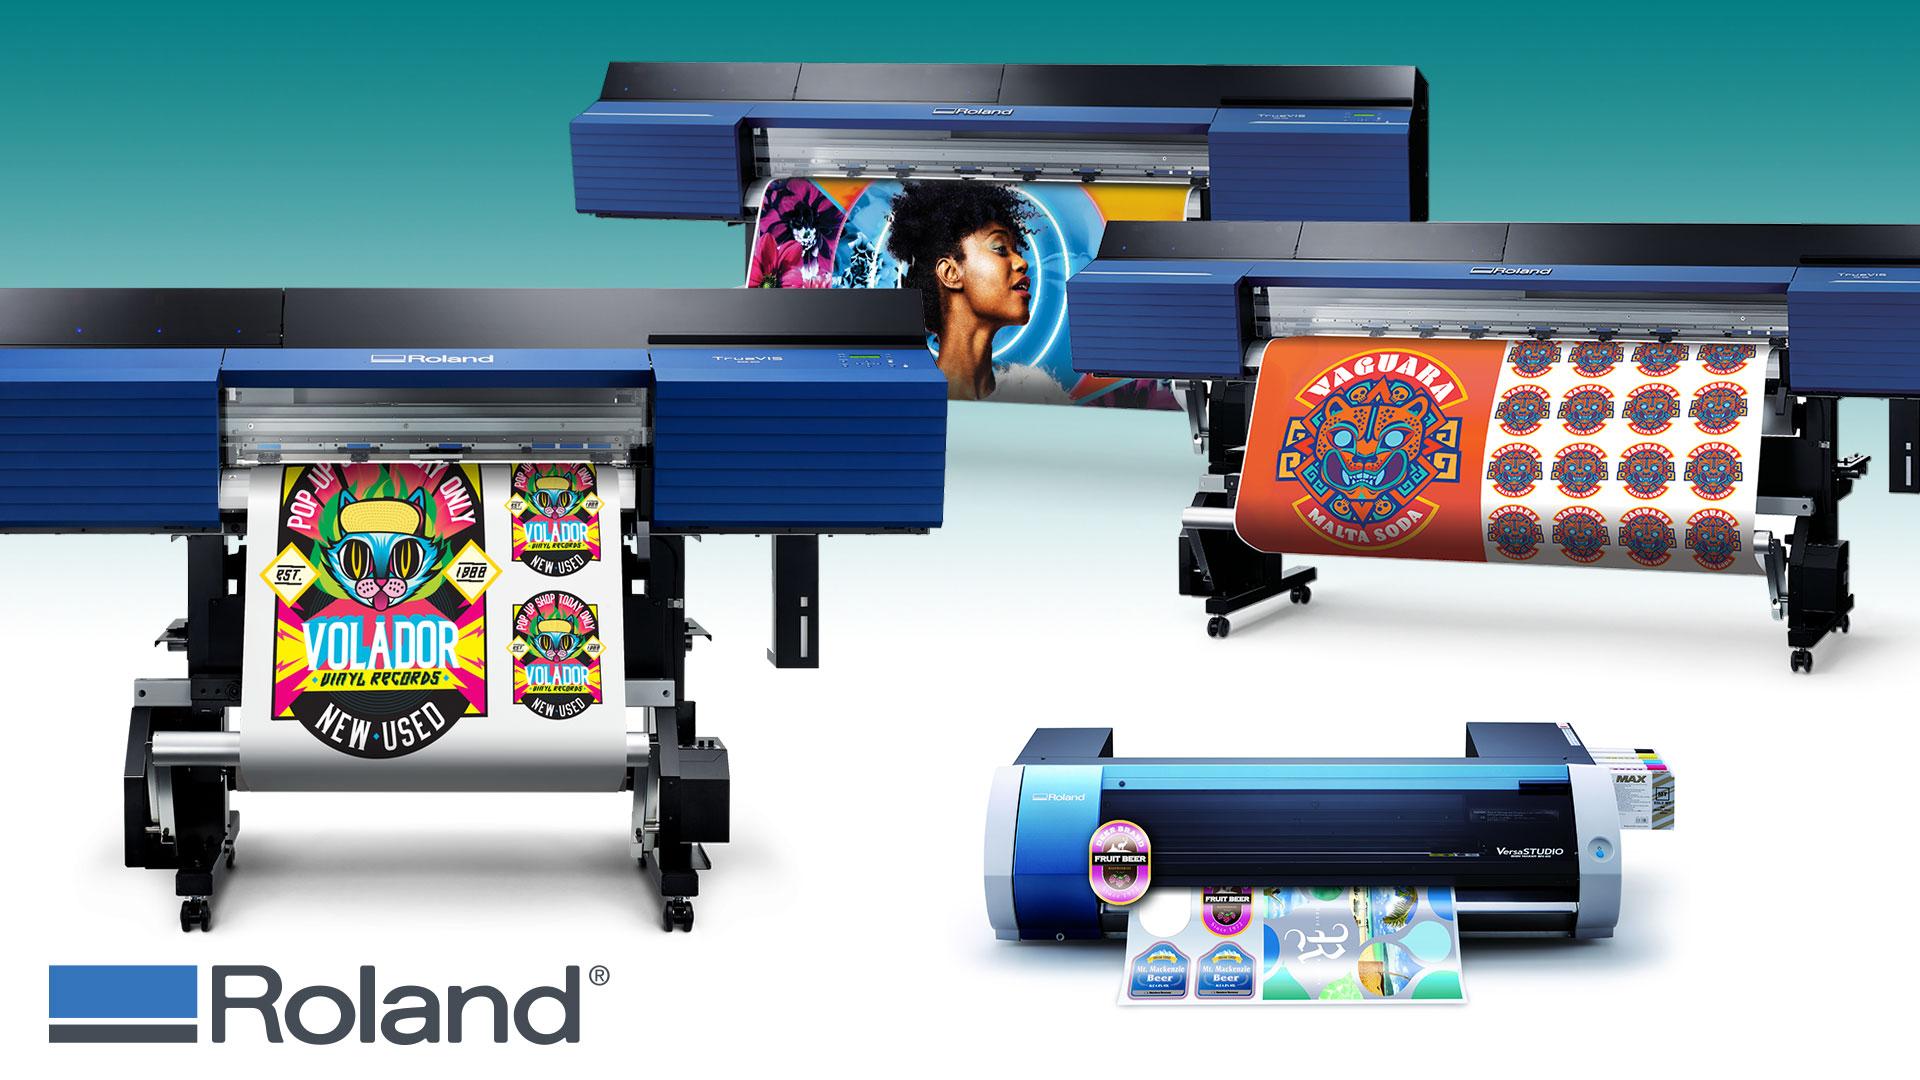 1920x1080 Roland Printers 1